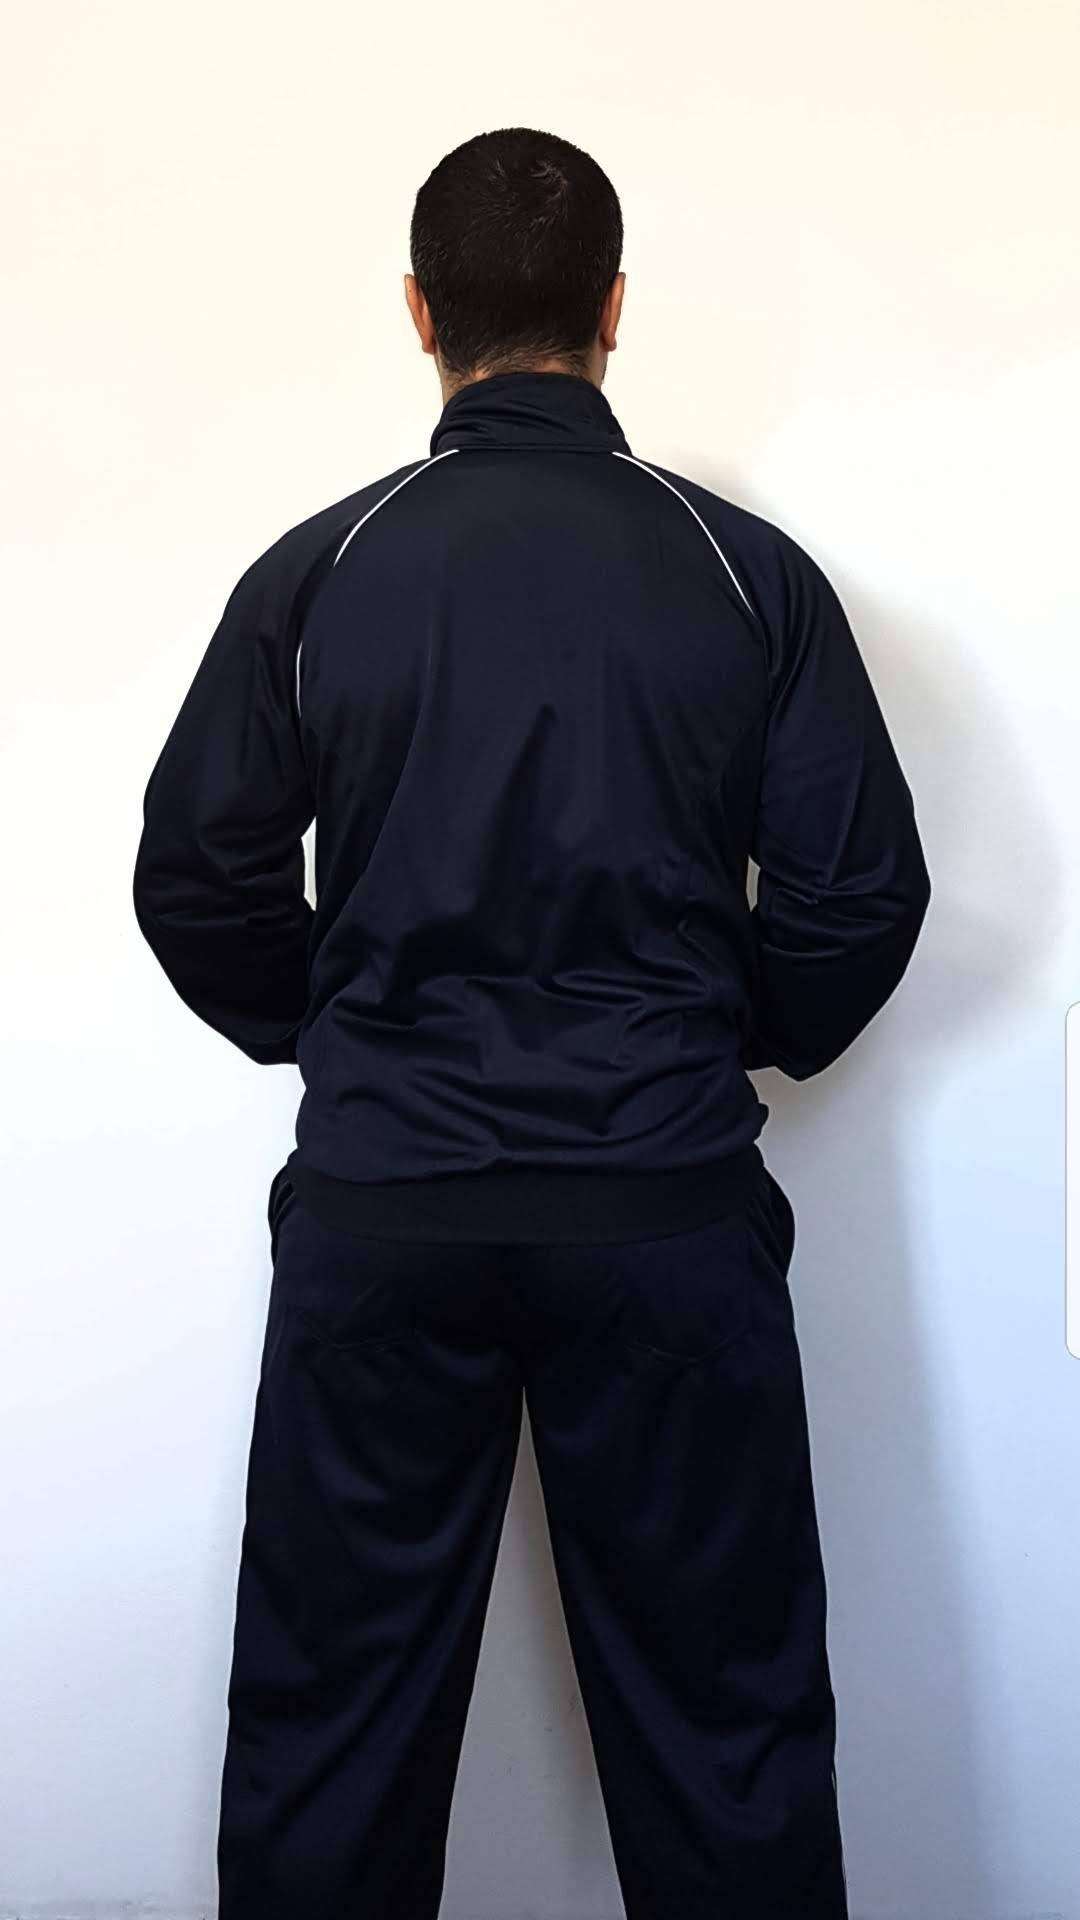 Agasalho Jiu Jitsu Brasil Martial Arts Shodo nas cores: Preto ou Azul escuro